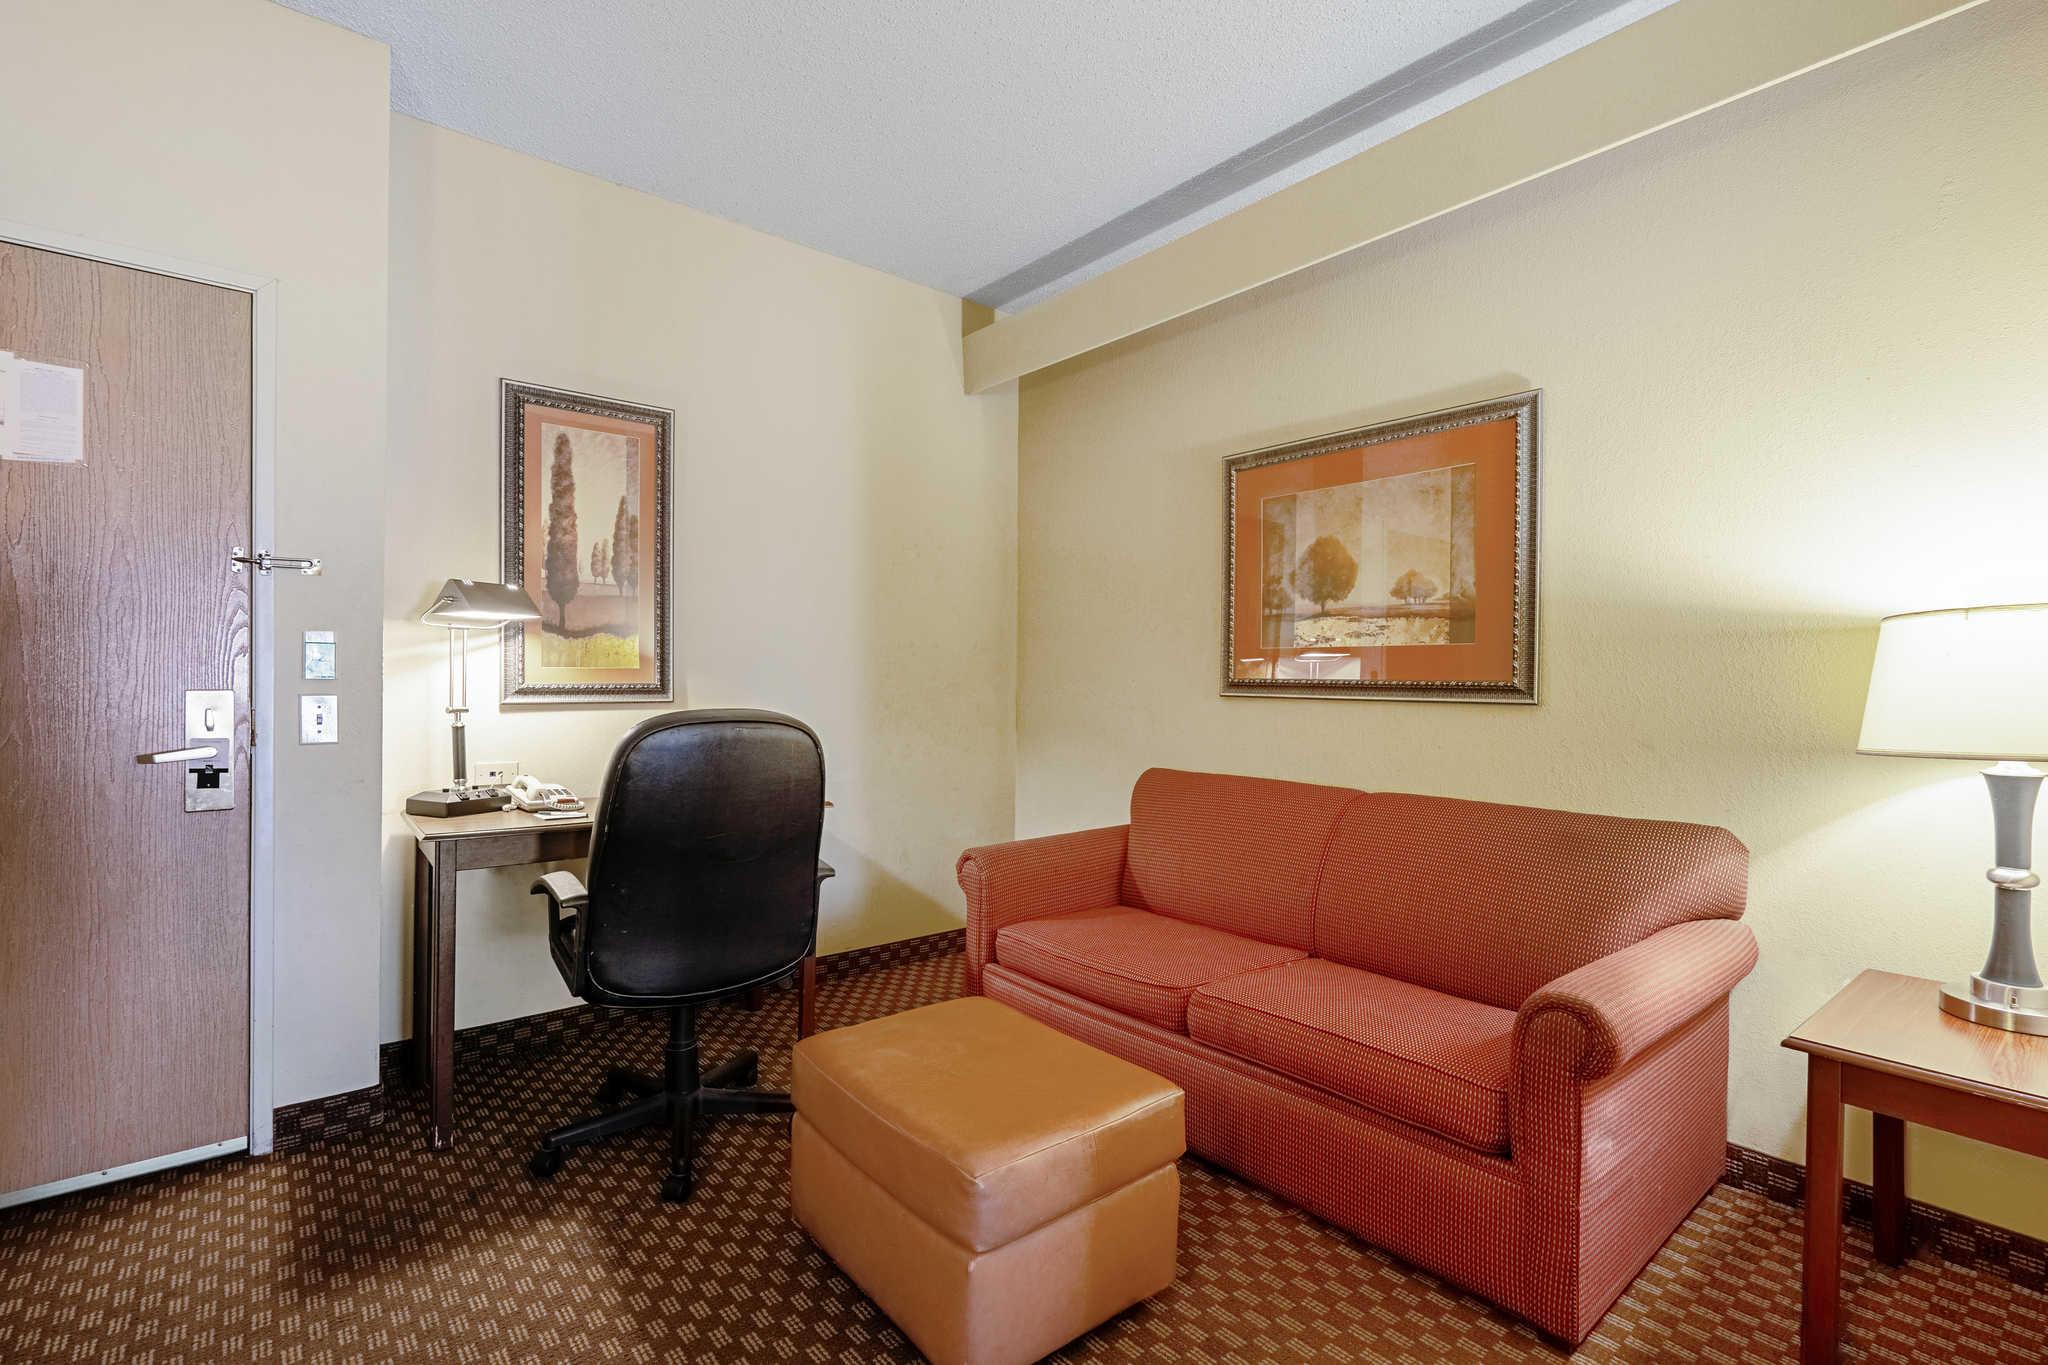 Quality Suites image 27